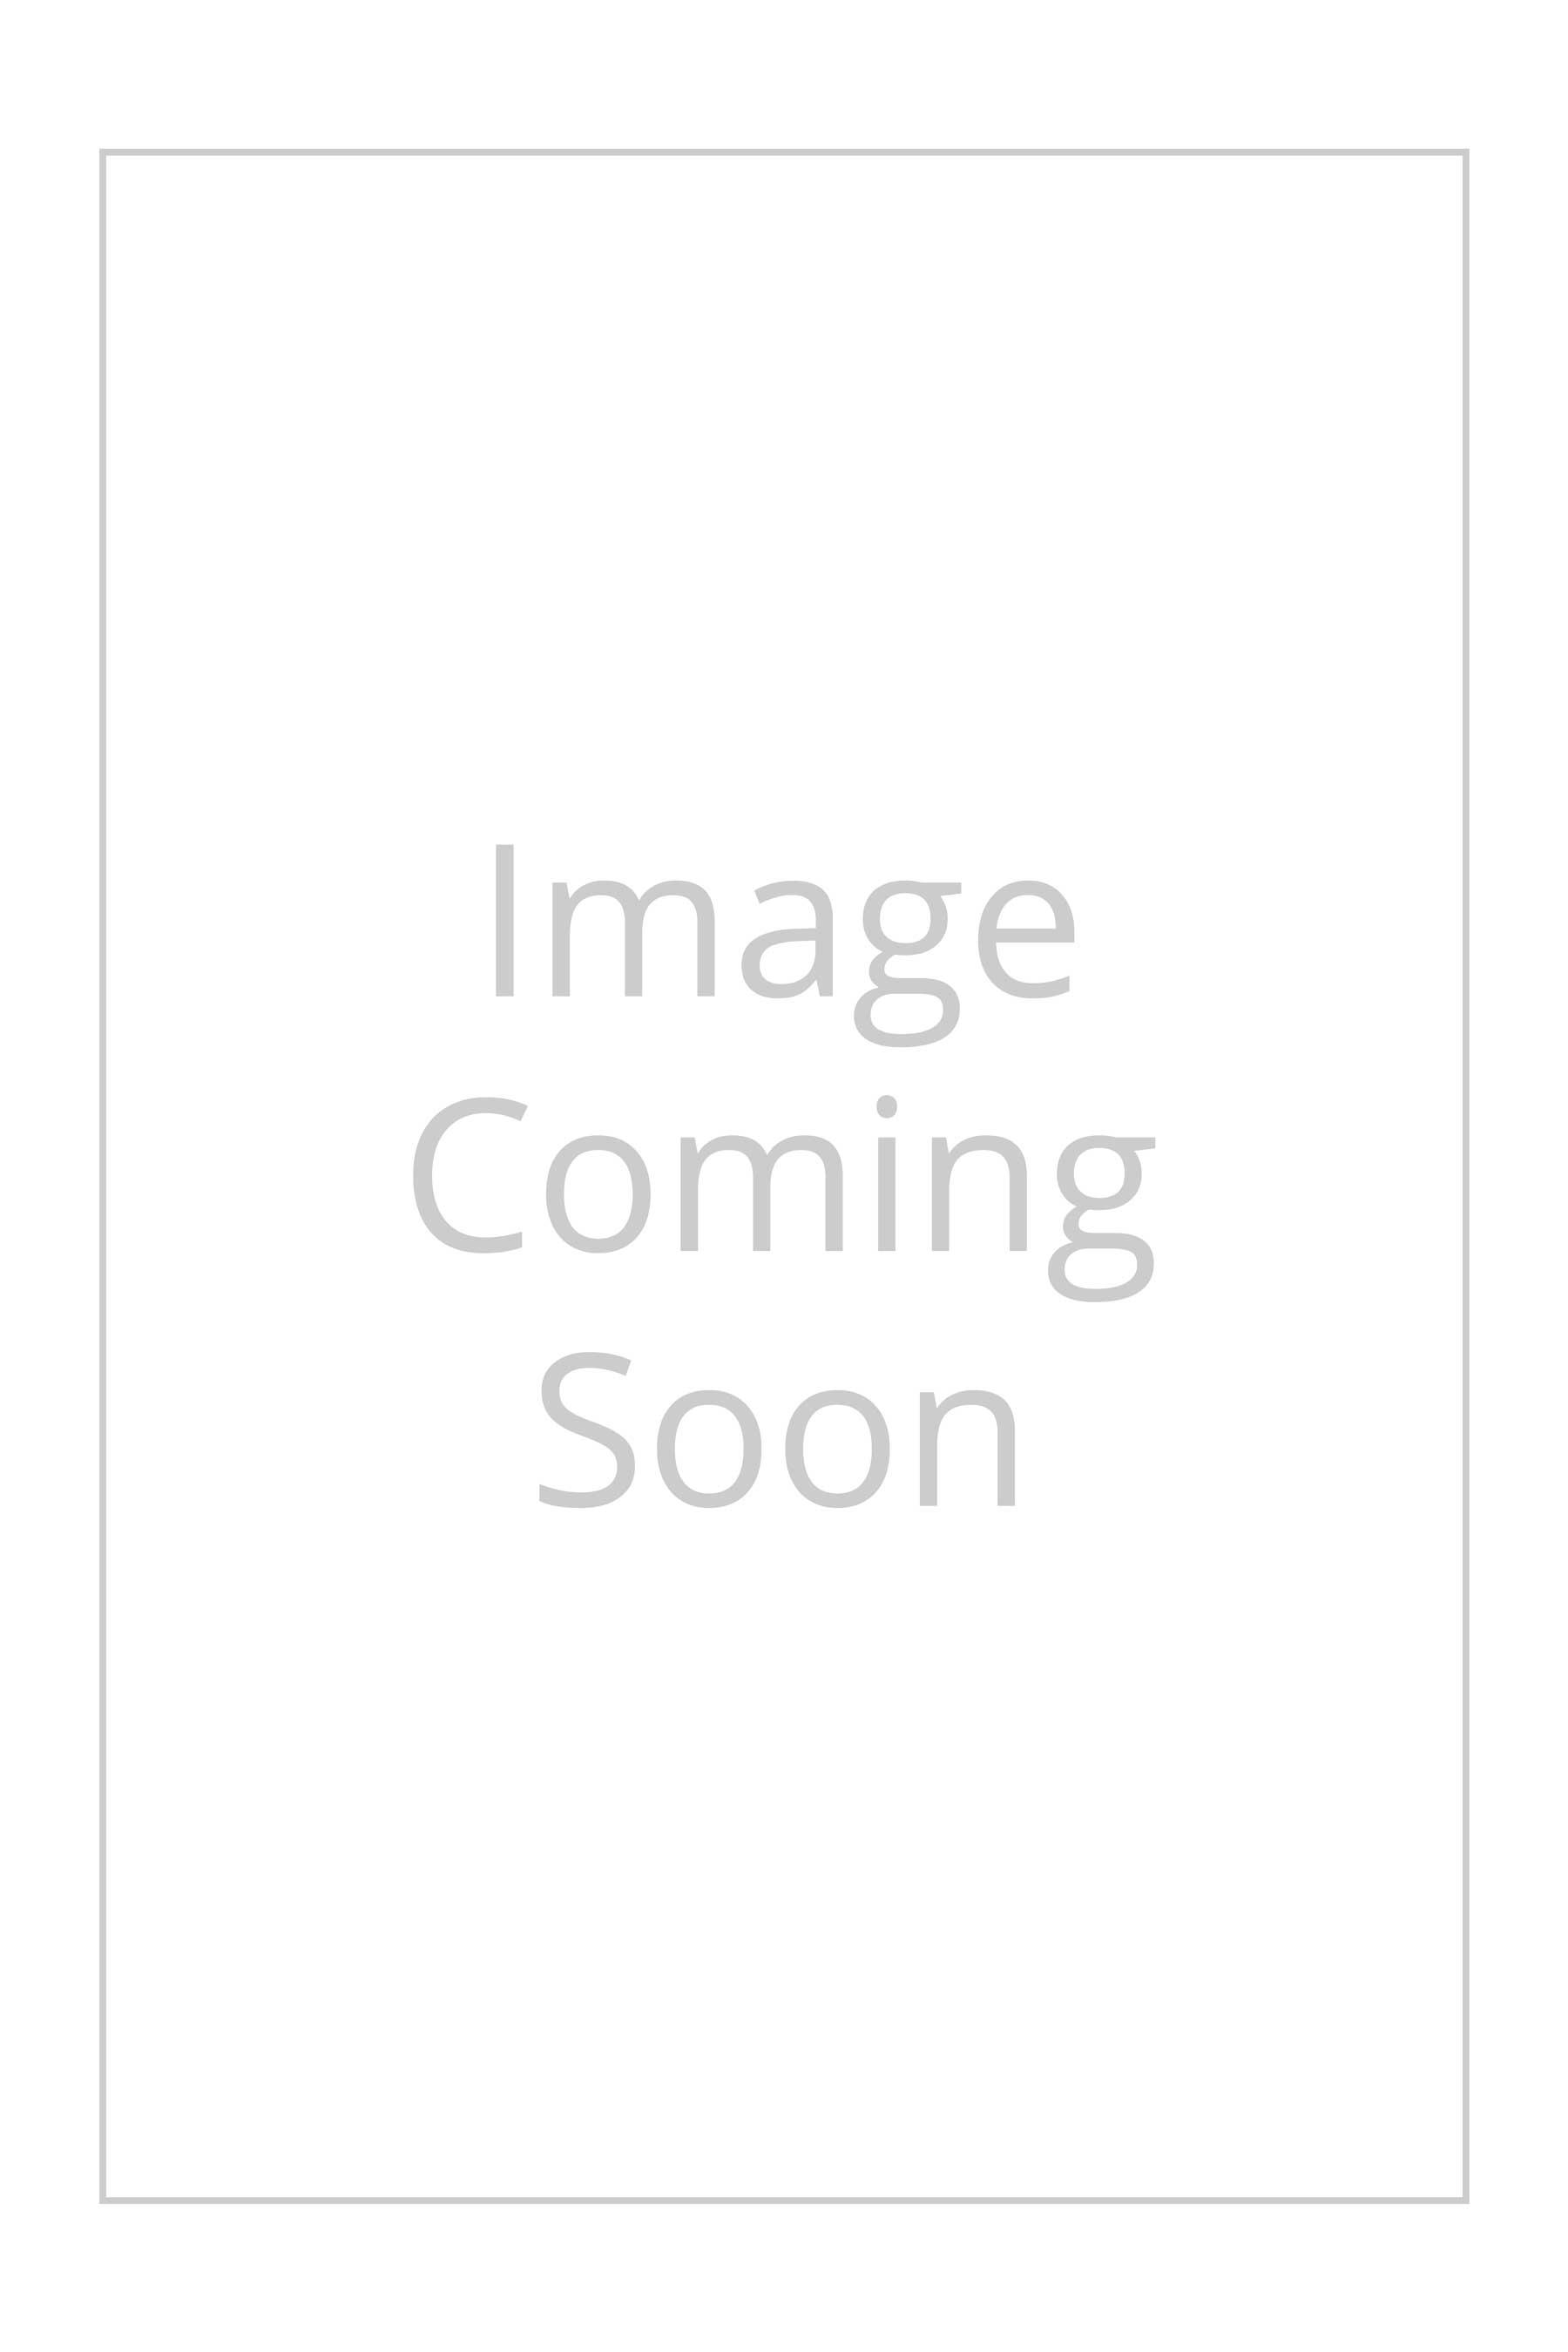 Ralph Lauren Off-White 100% Cashmere Sleeveless Knit Top